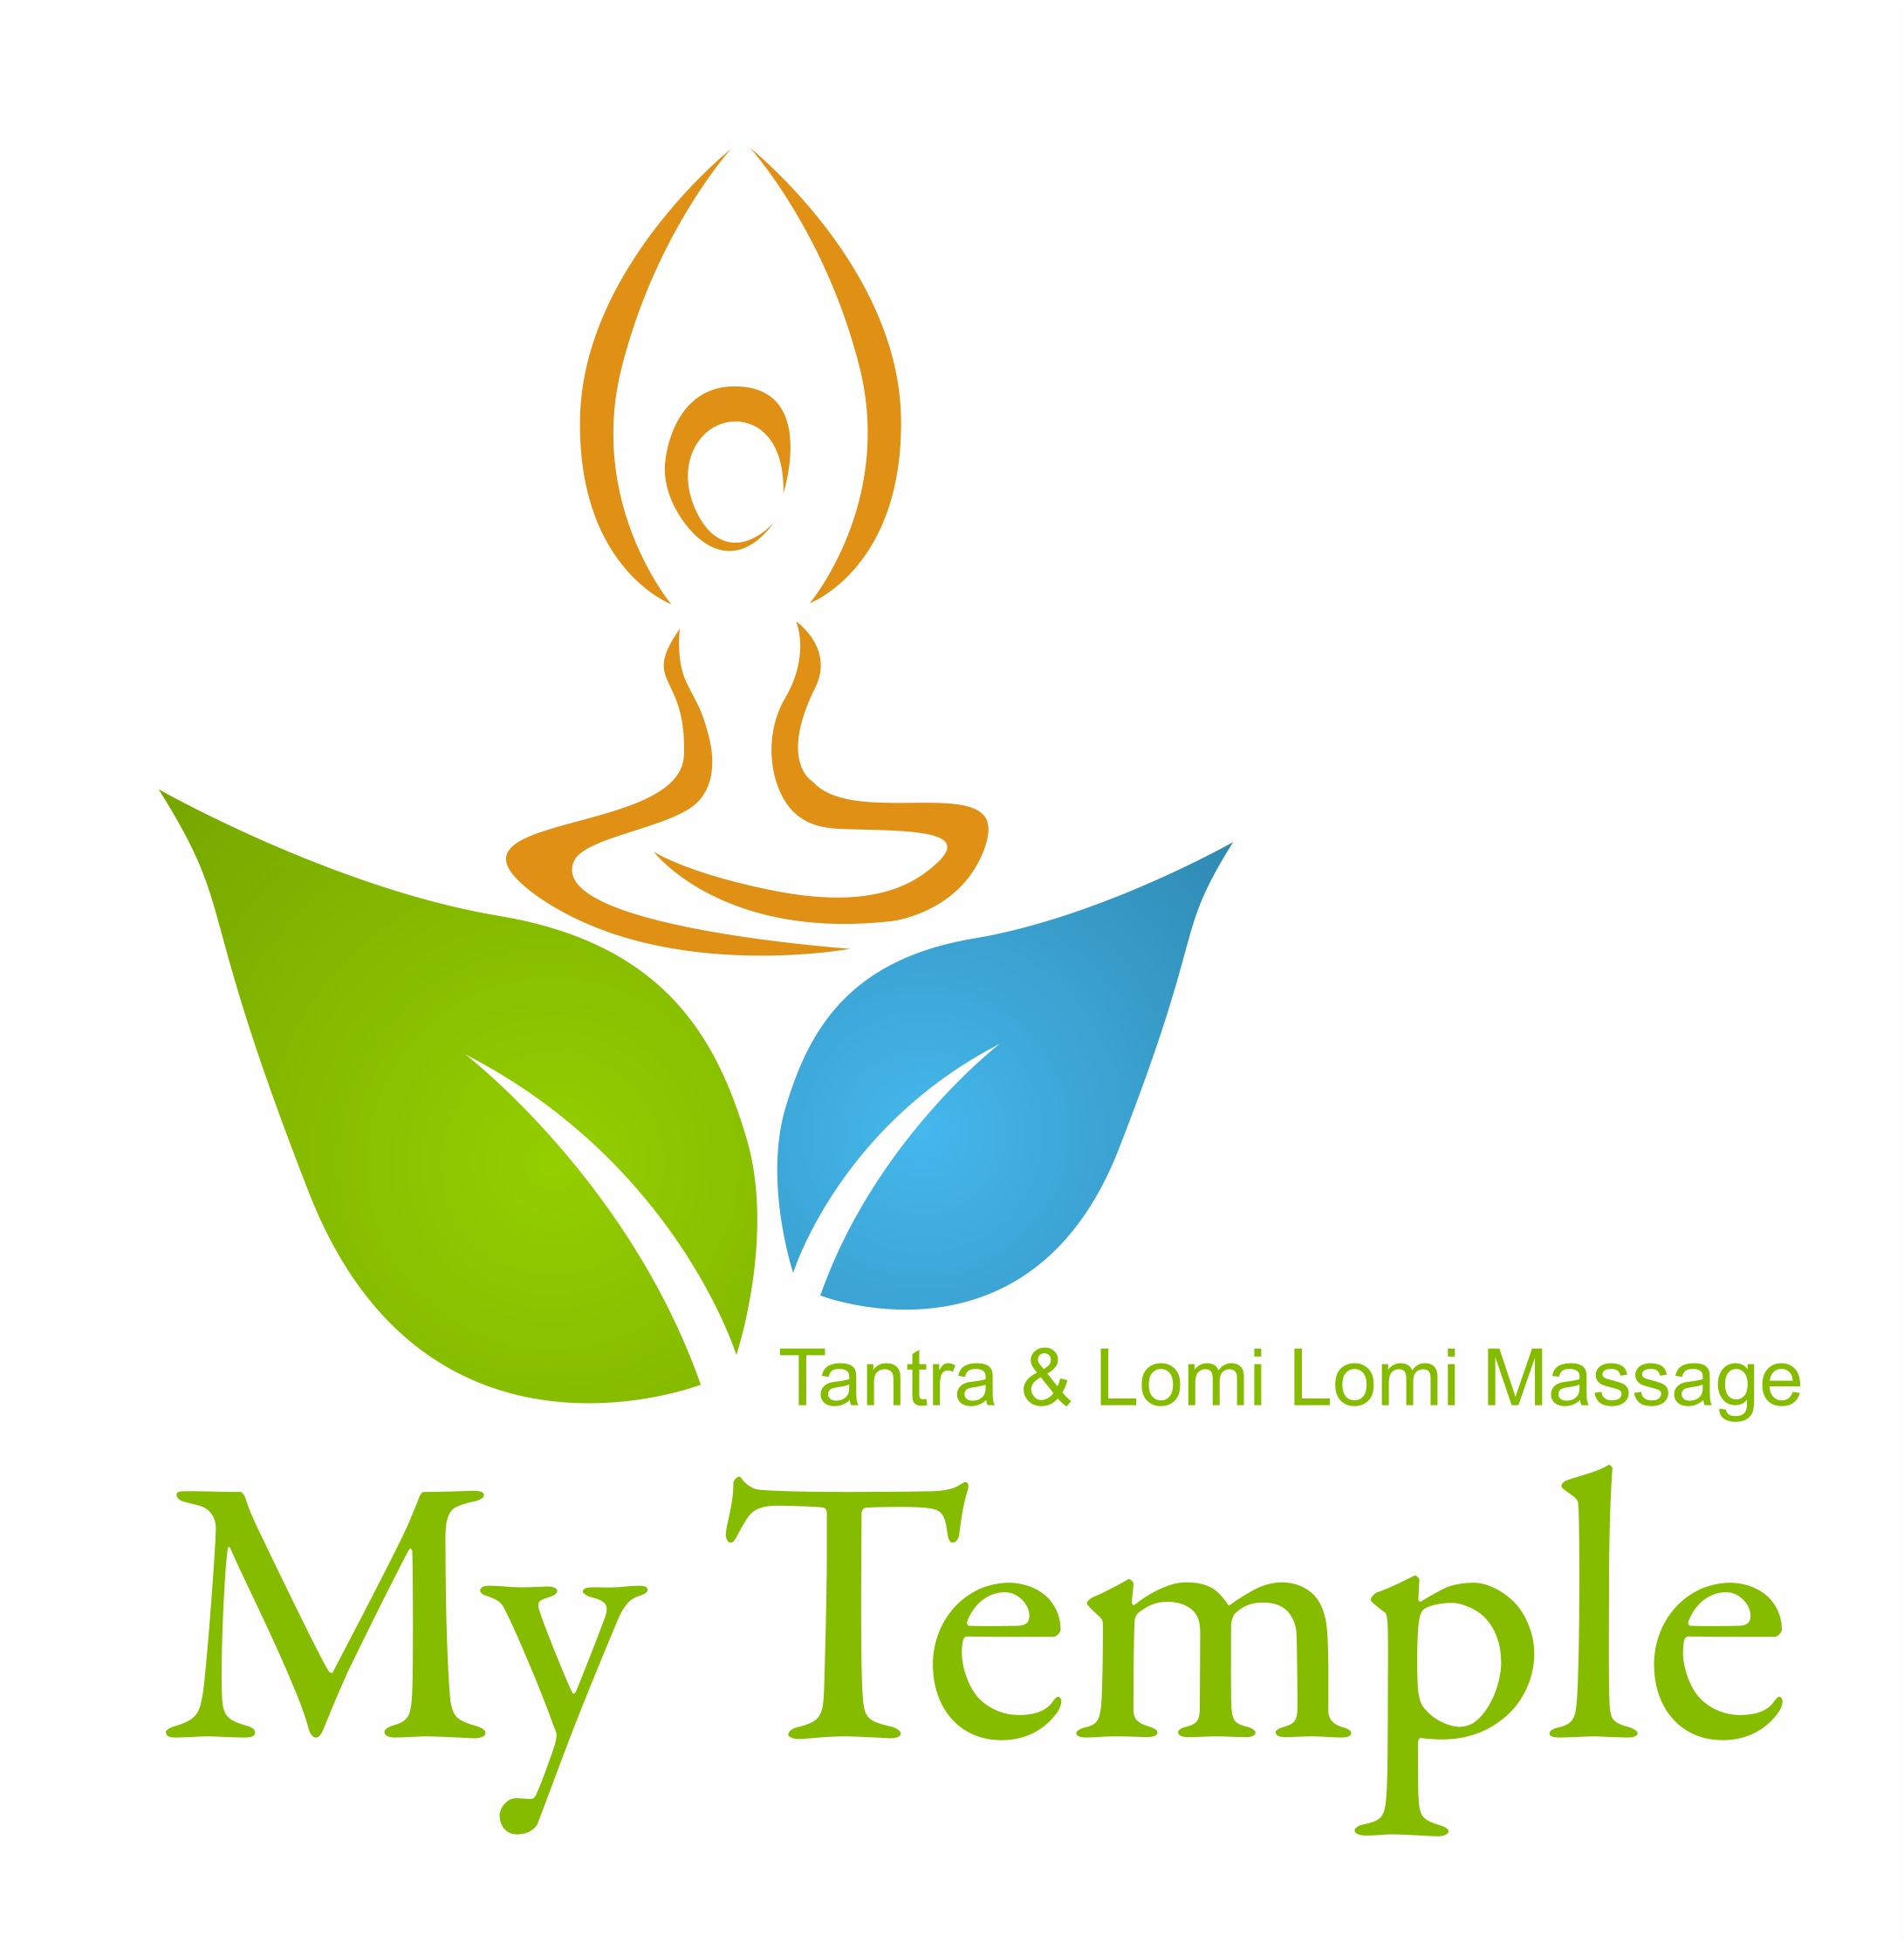 Lomi & tantra lomi massage 🔥 Erotic